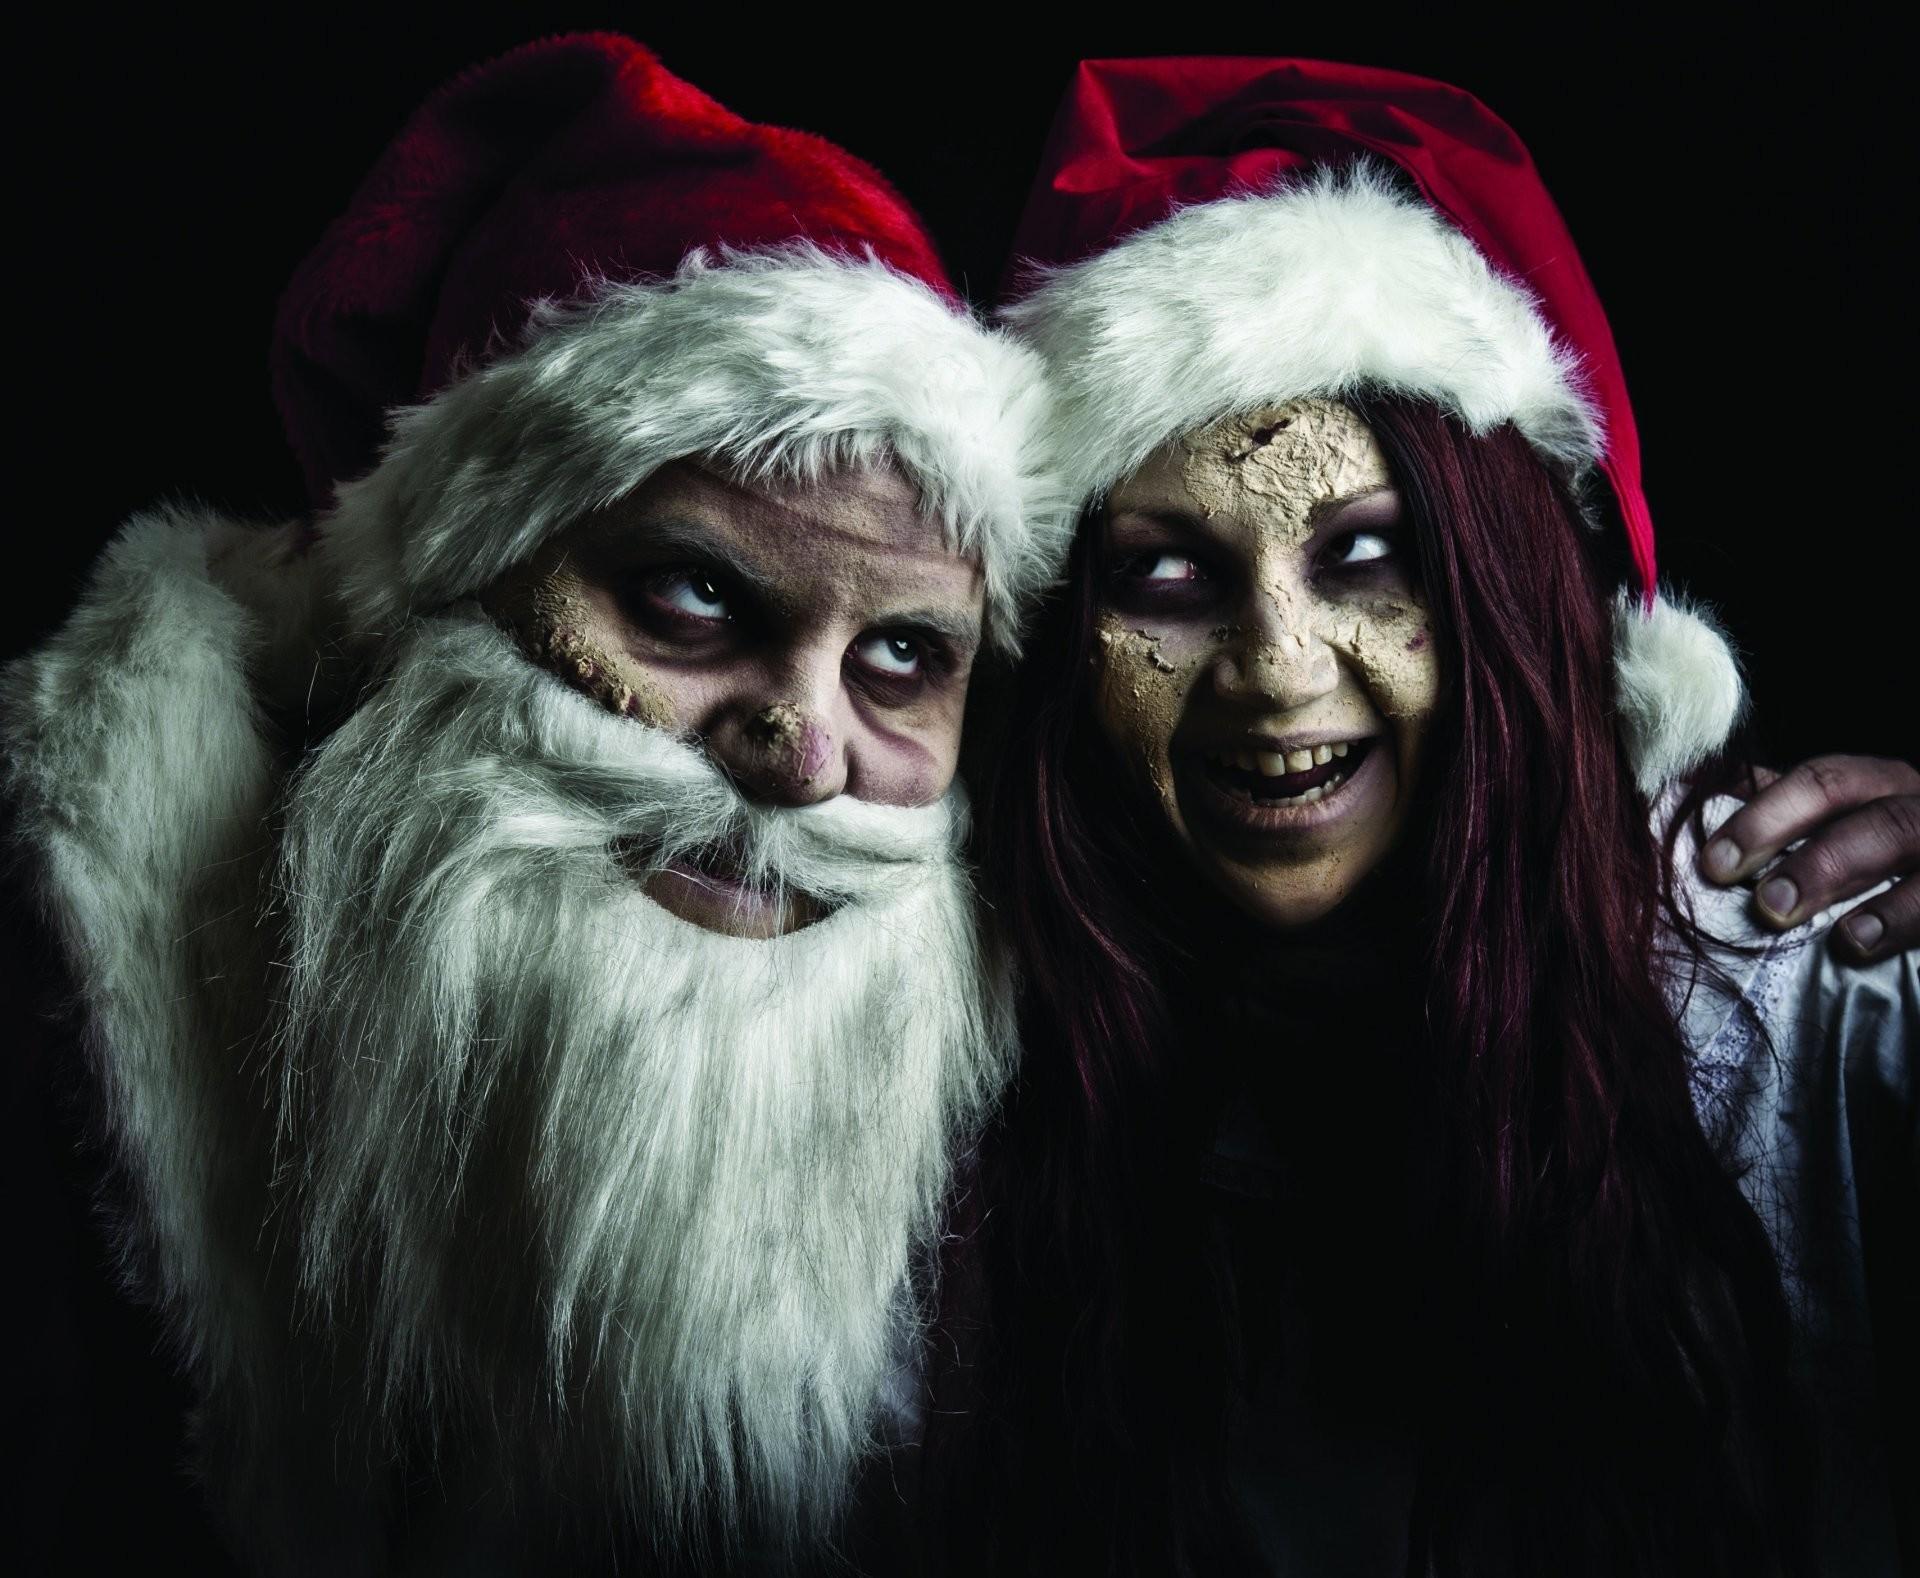 Christmas Zombie Wallpaper.Evil Christmas Wallpaper 64 Images